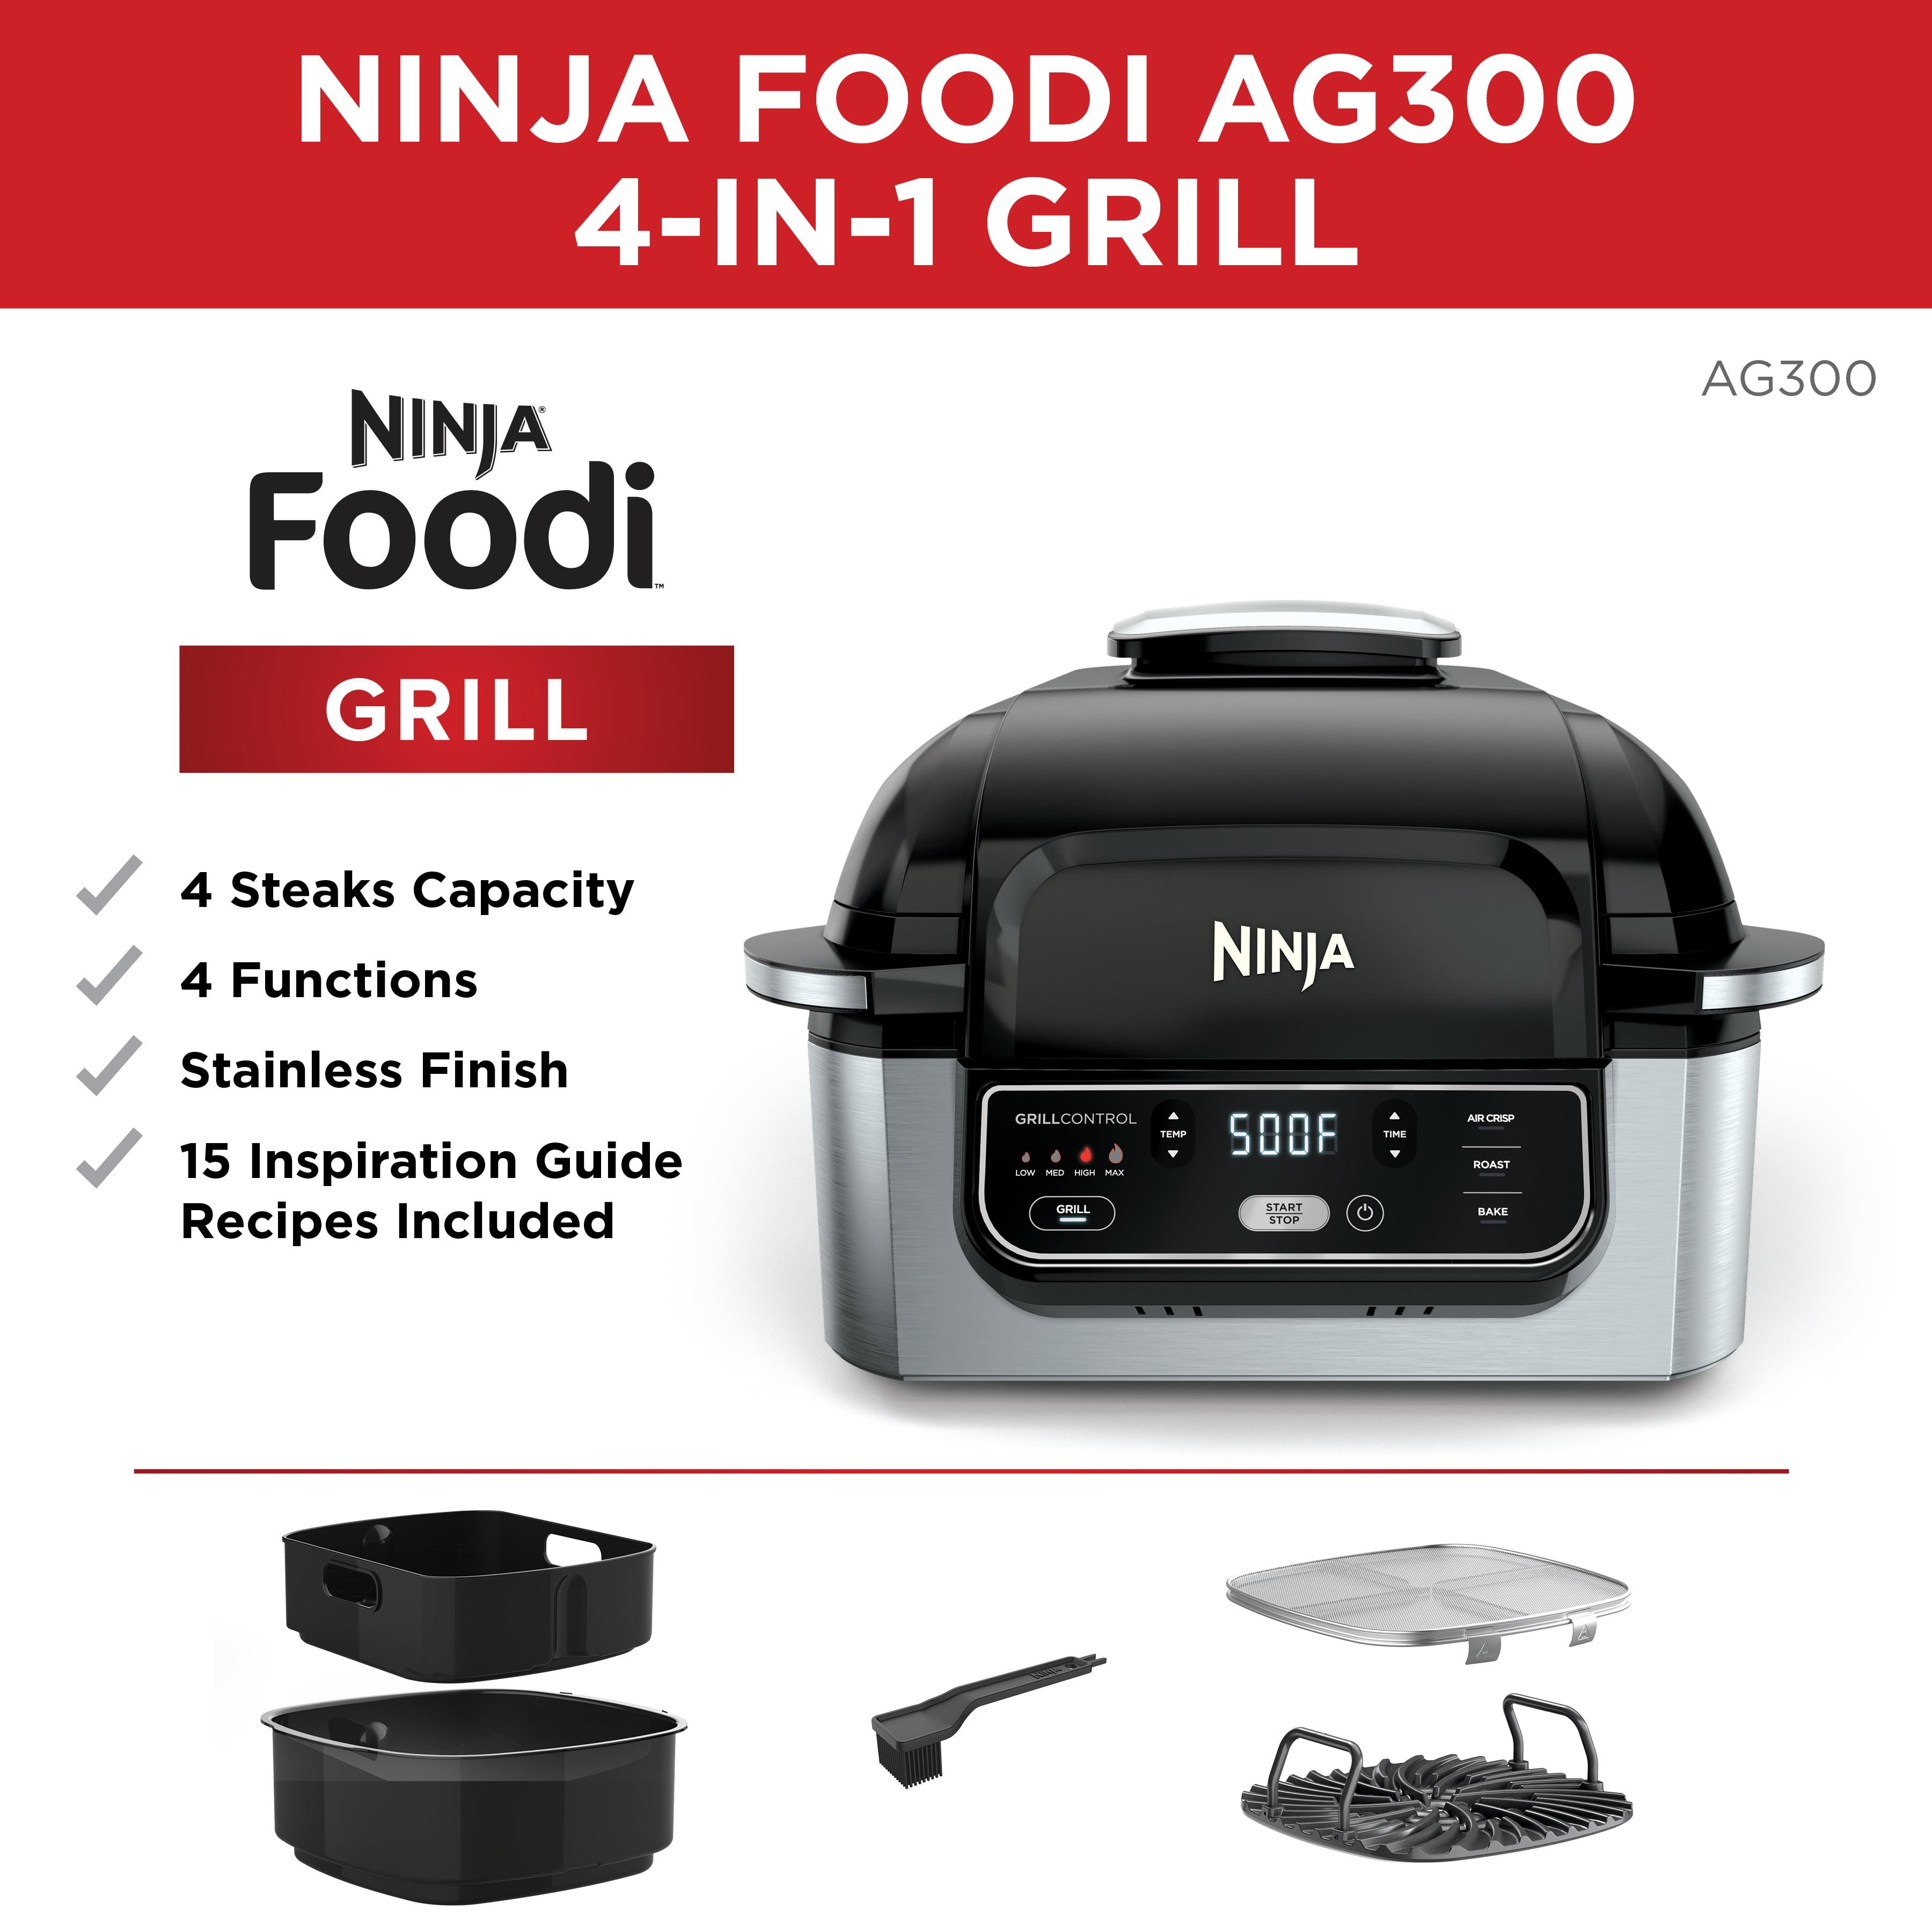 Bake Ninja Foodi 4-in-1 Indoor Grill 4-Quart Air Fryer Roast AG300 Grill